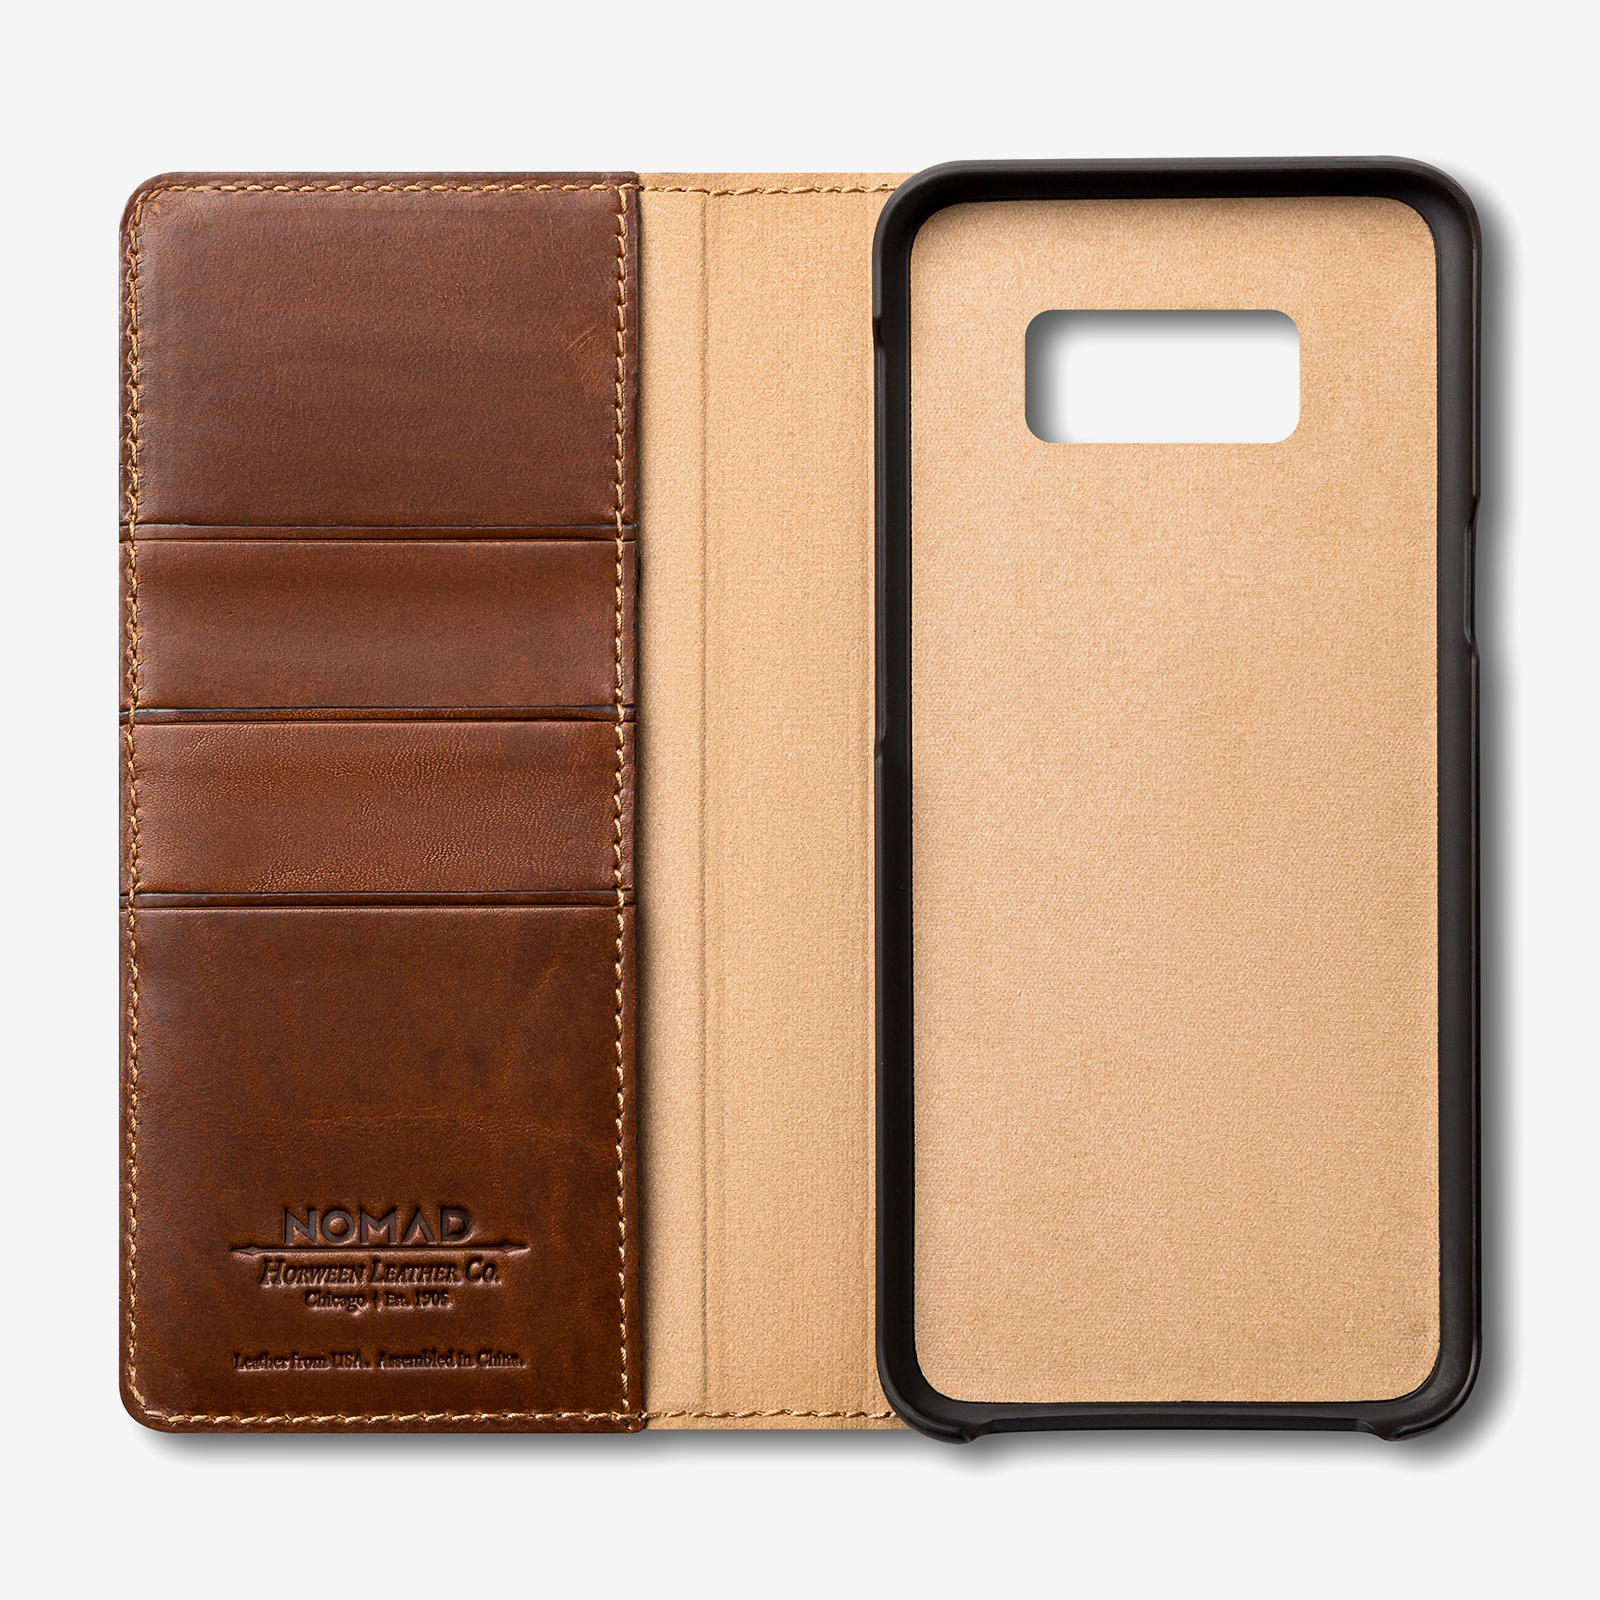 Phone case product photo